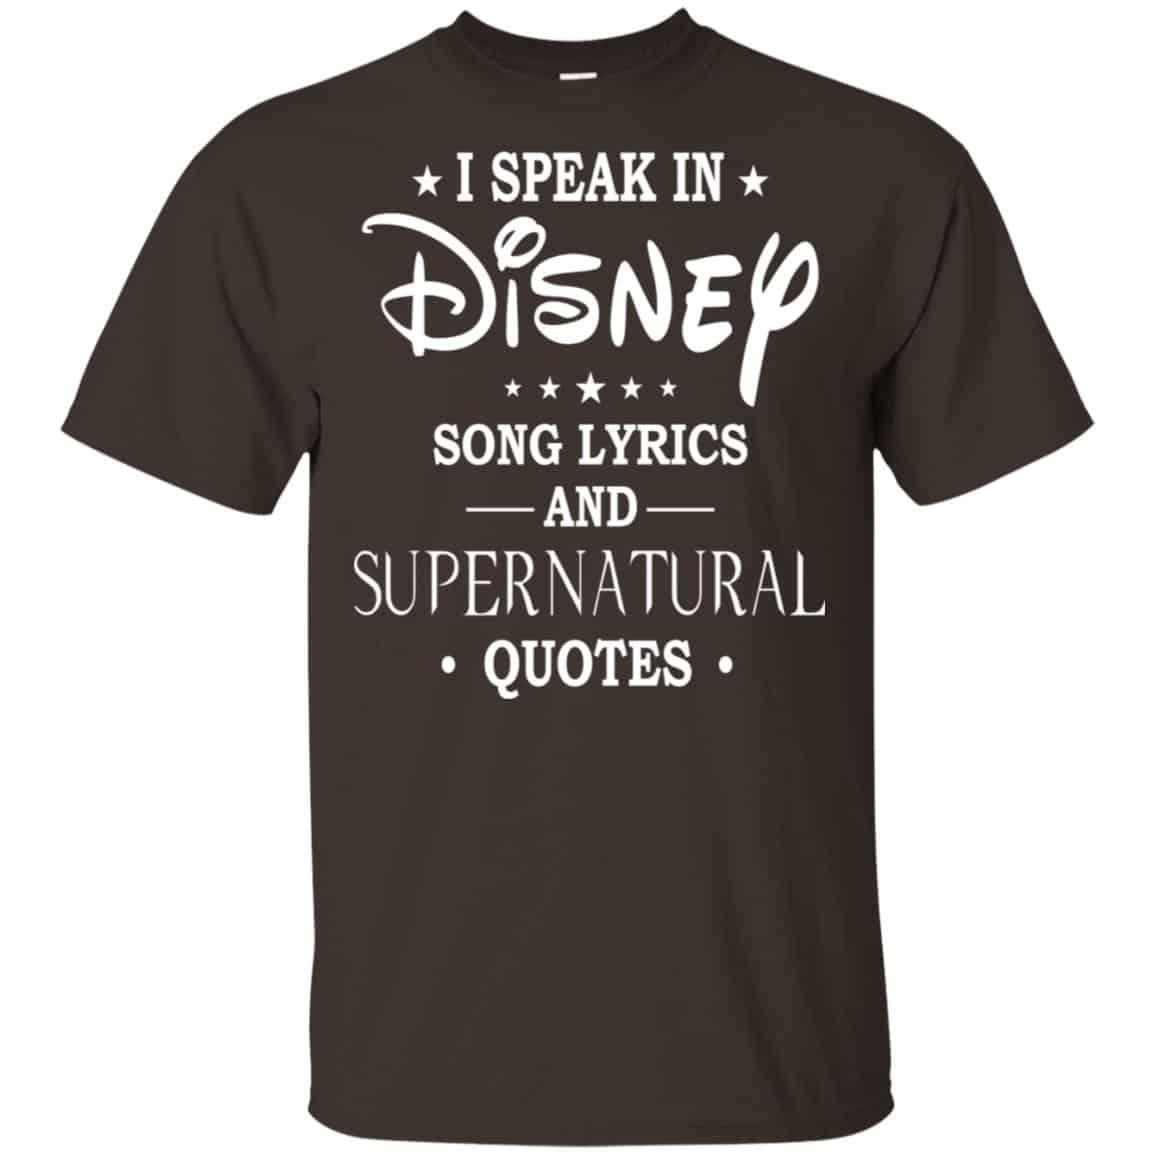 i speak in disney song lyrics and supernatural quotes shirt